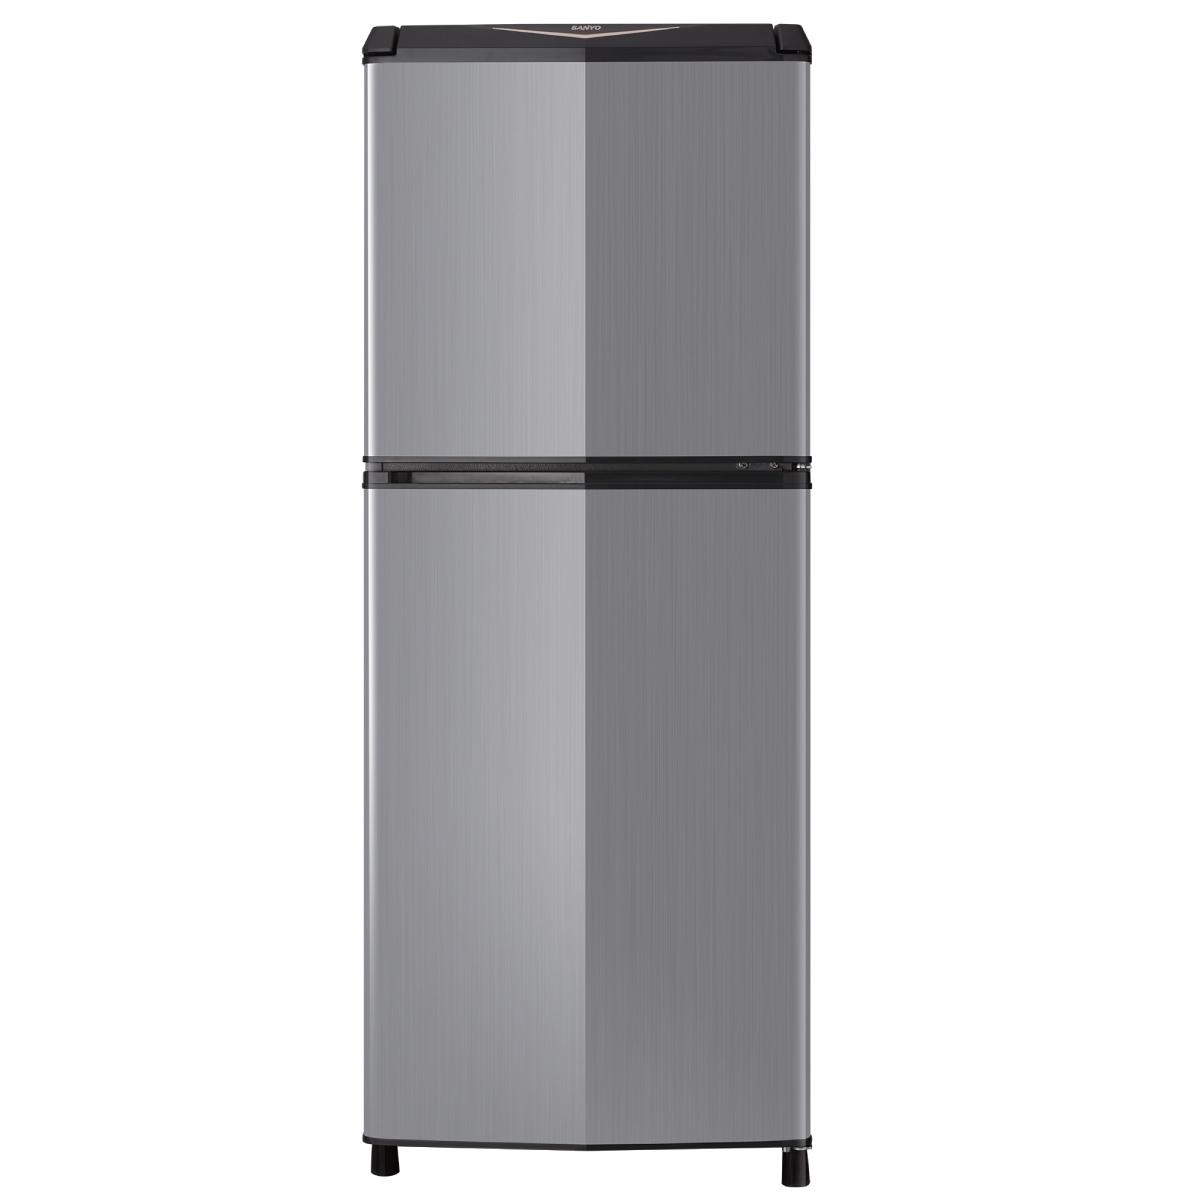 Sanyo Refrigerator Price List - Best Refrigerator 2017